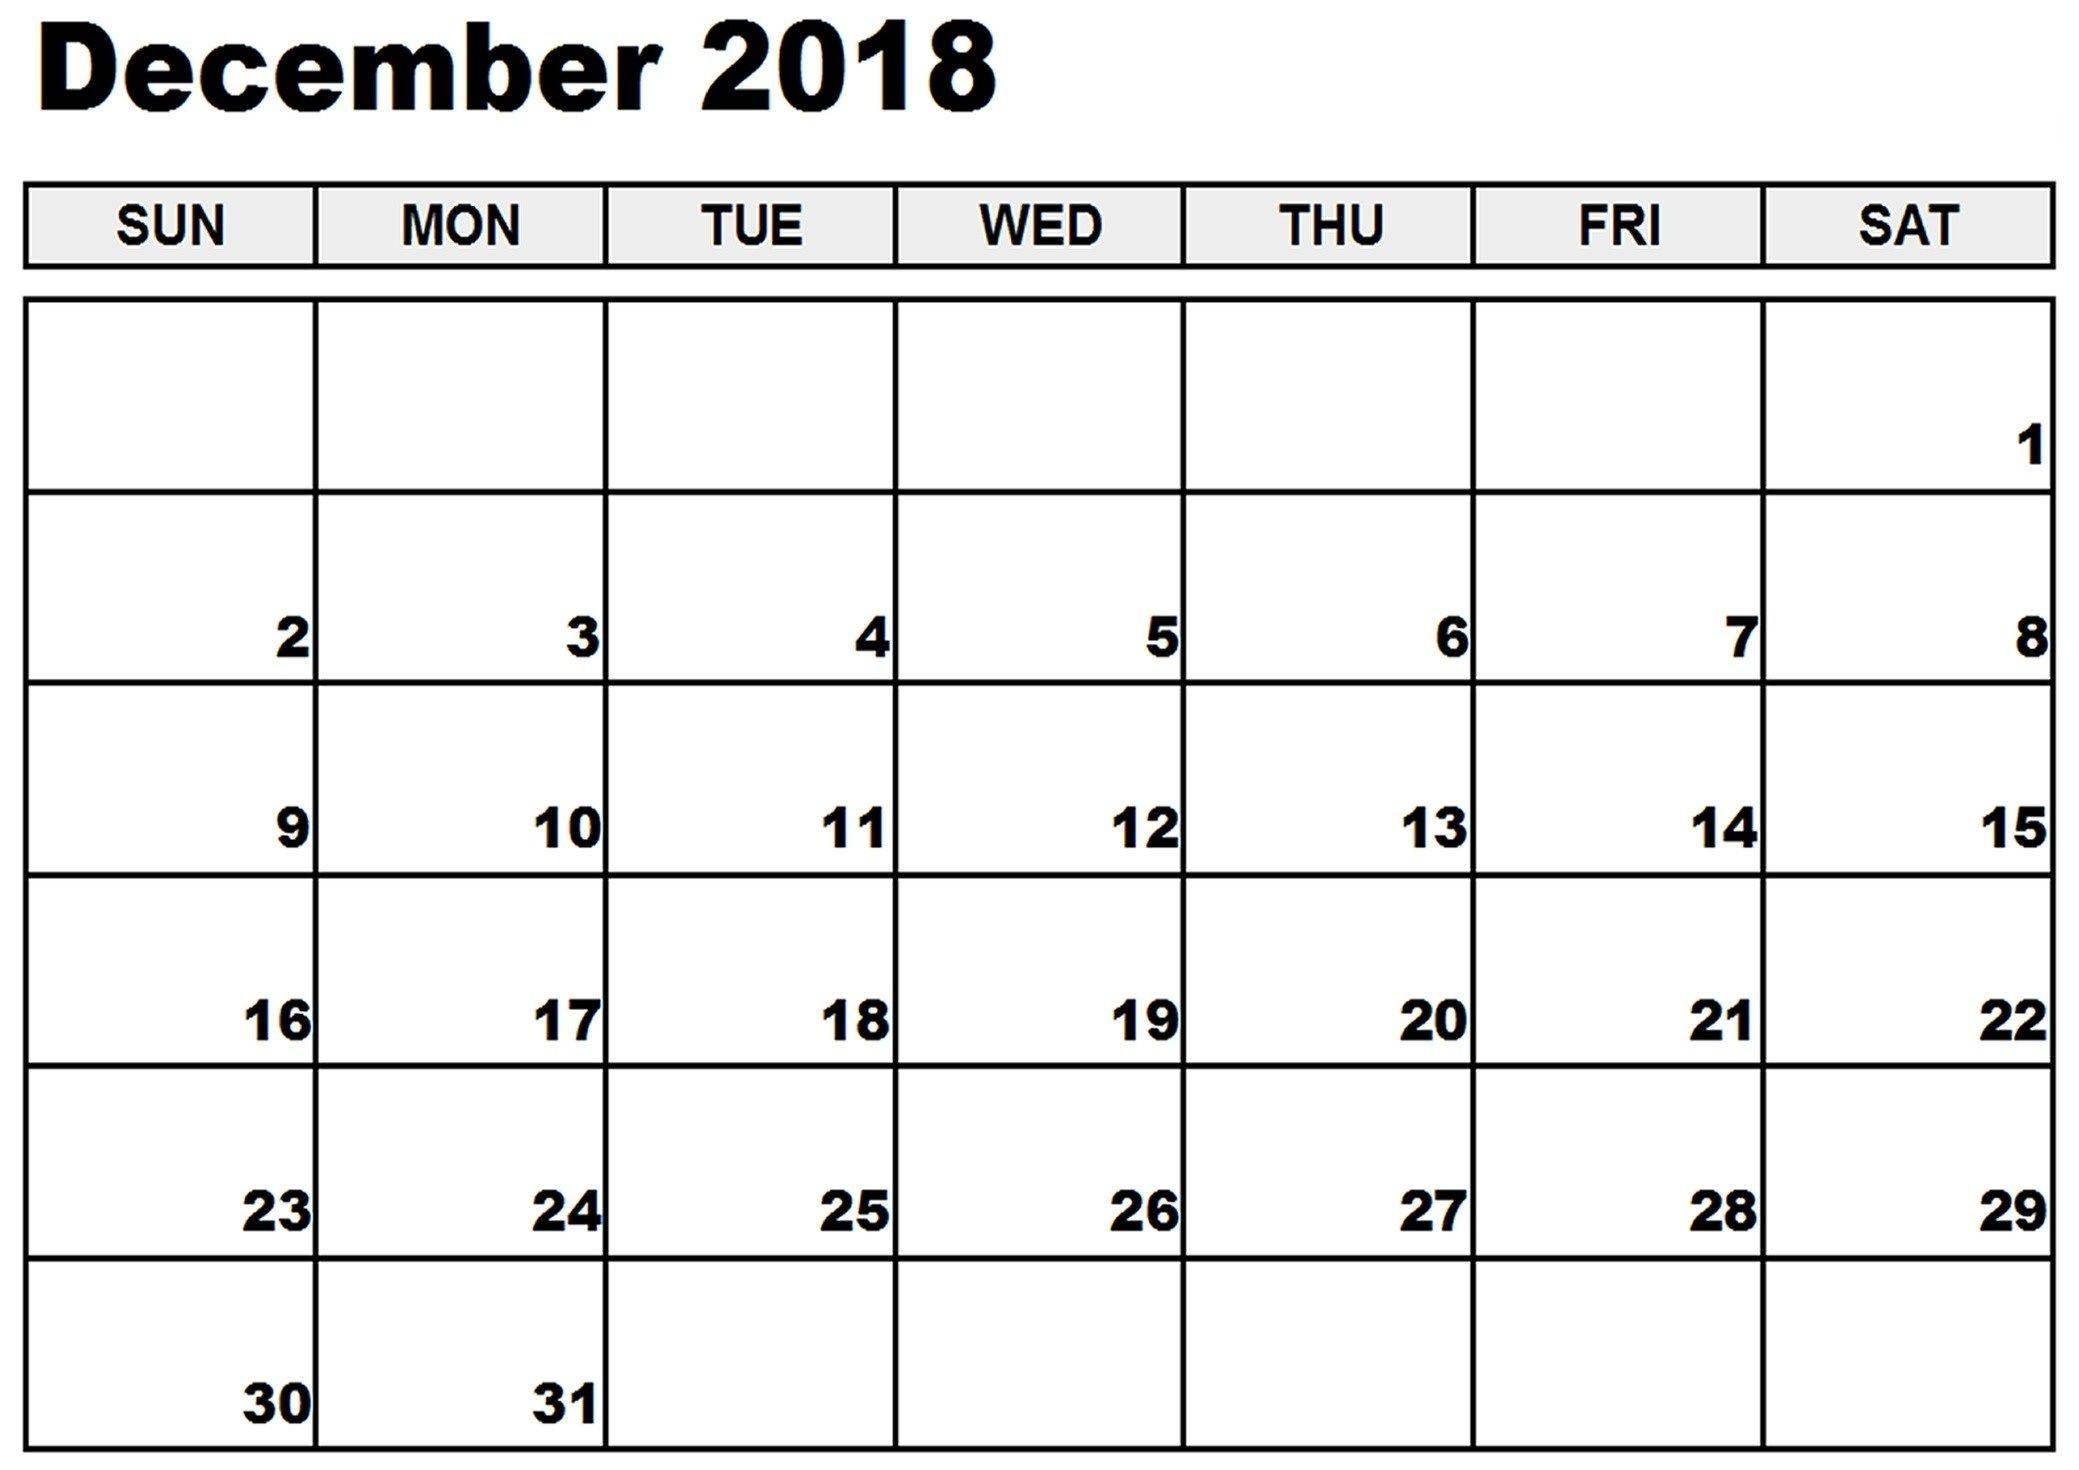 December 2018 Printable Calendar Notes To Do List Reminders pertaining to Blank Dec Calendar Printable